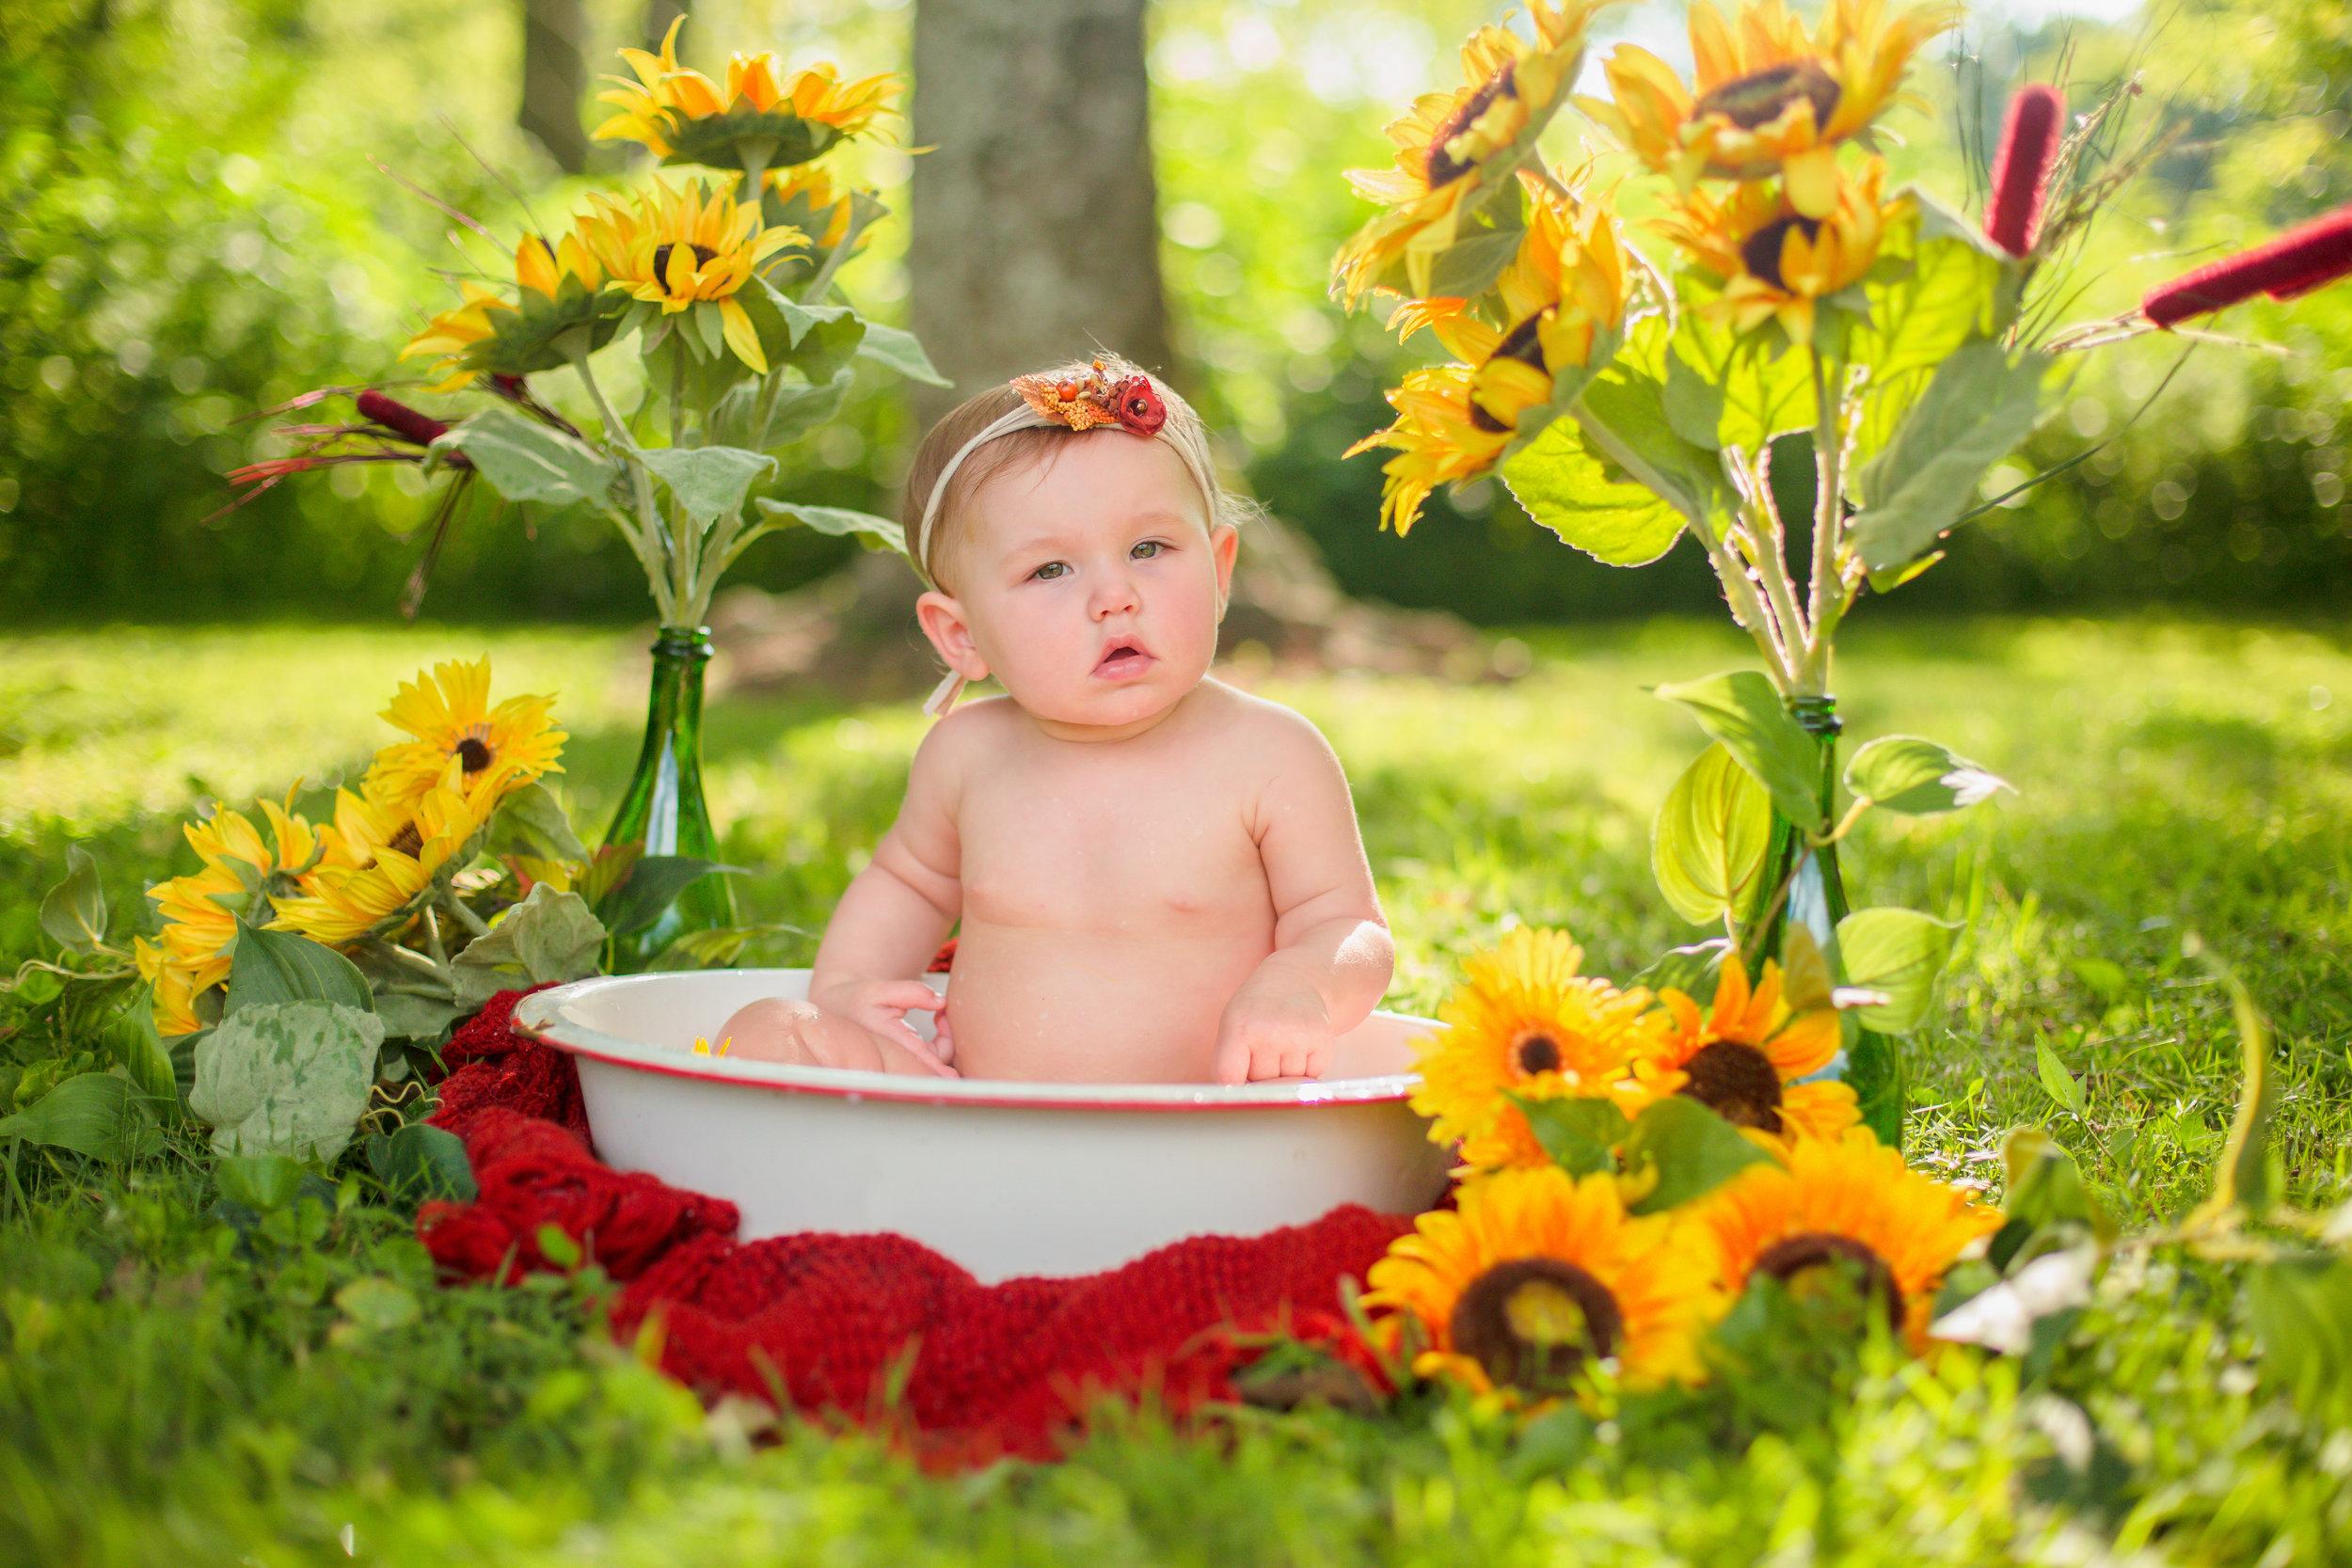 Sawyer-Jo-Sunflower-Milk-bath-Nashville-Family-Photographer-Chelsea-Meadows-Photography-(1).jpg